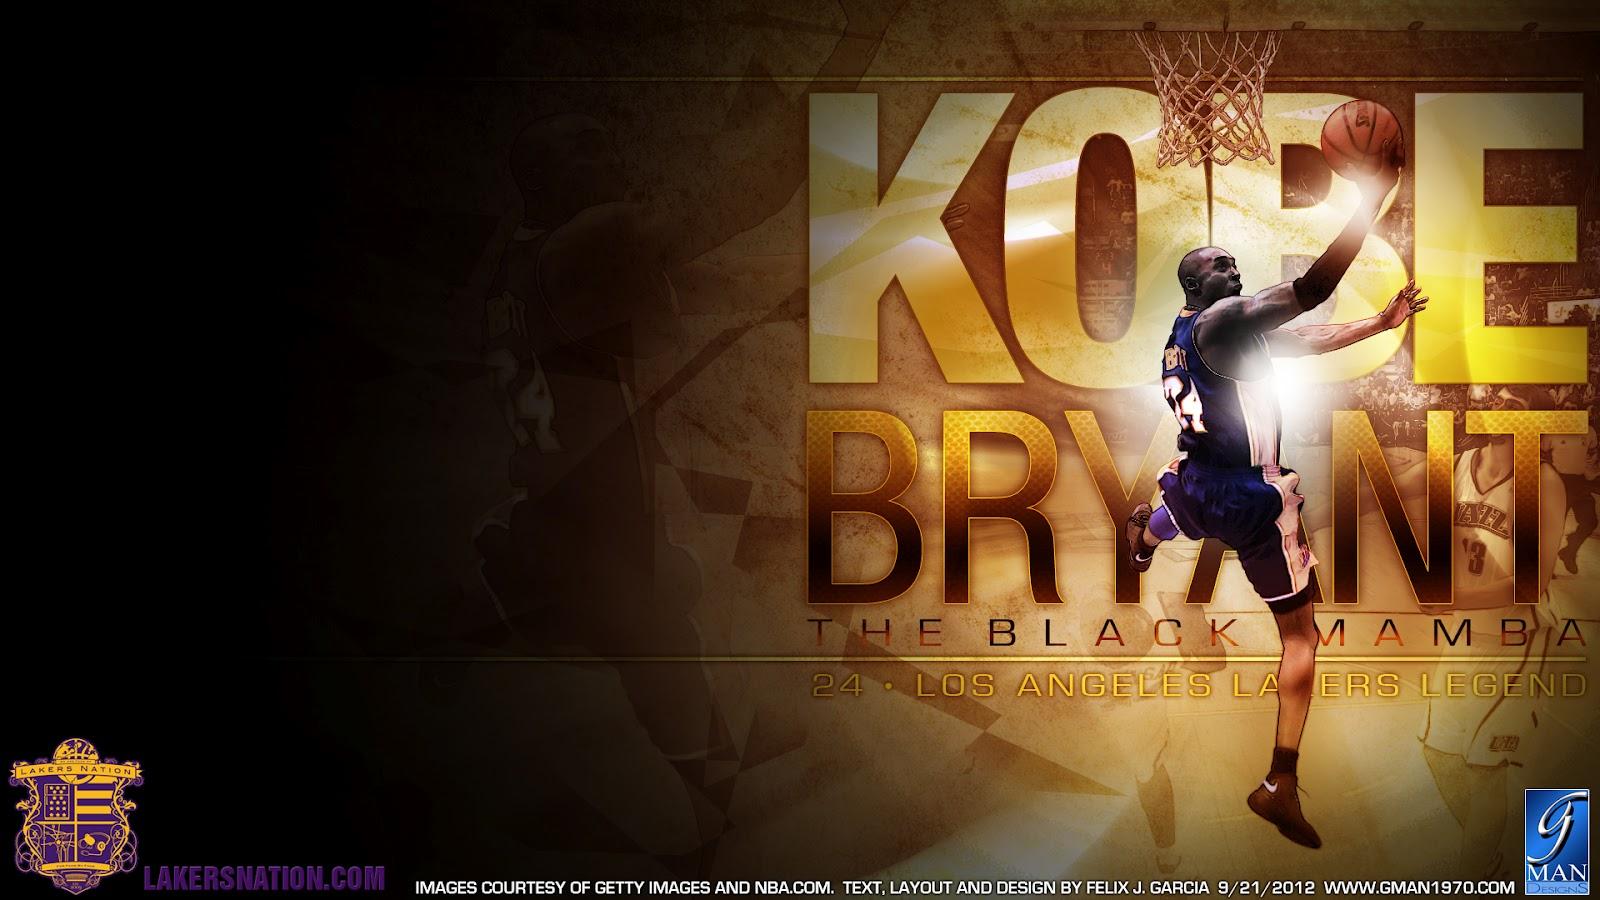 Iwallpapers Kobe Bryant Black Mamba Lakers Legend Wallpaper